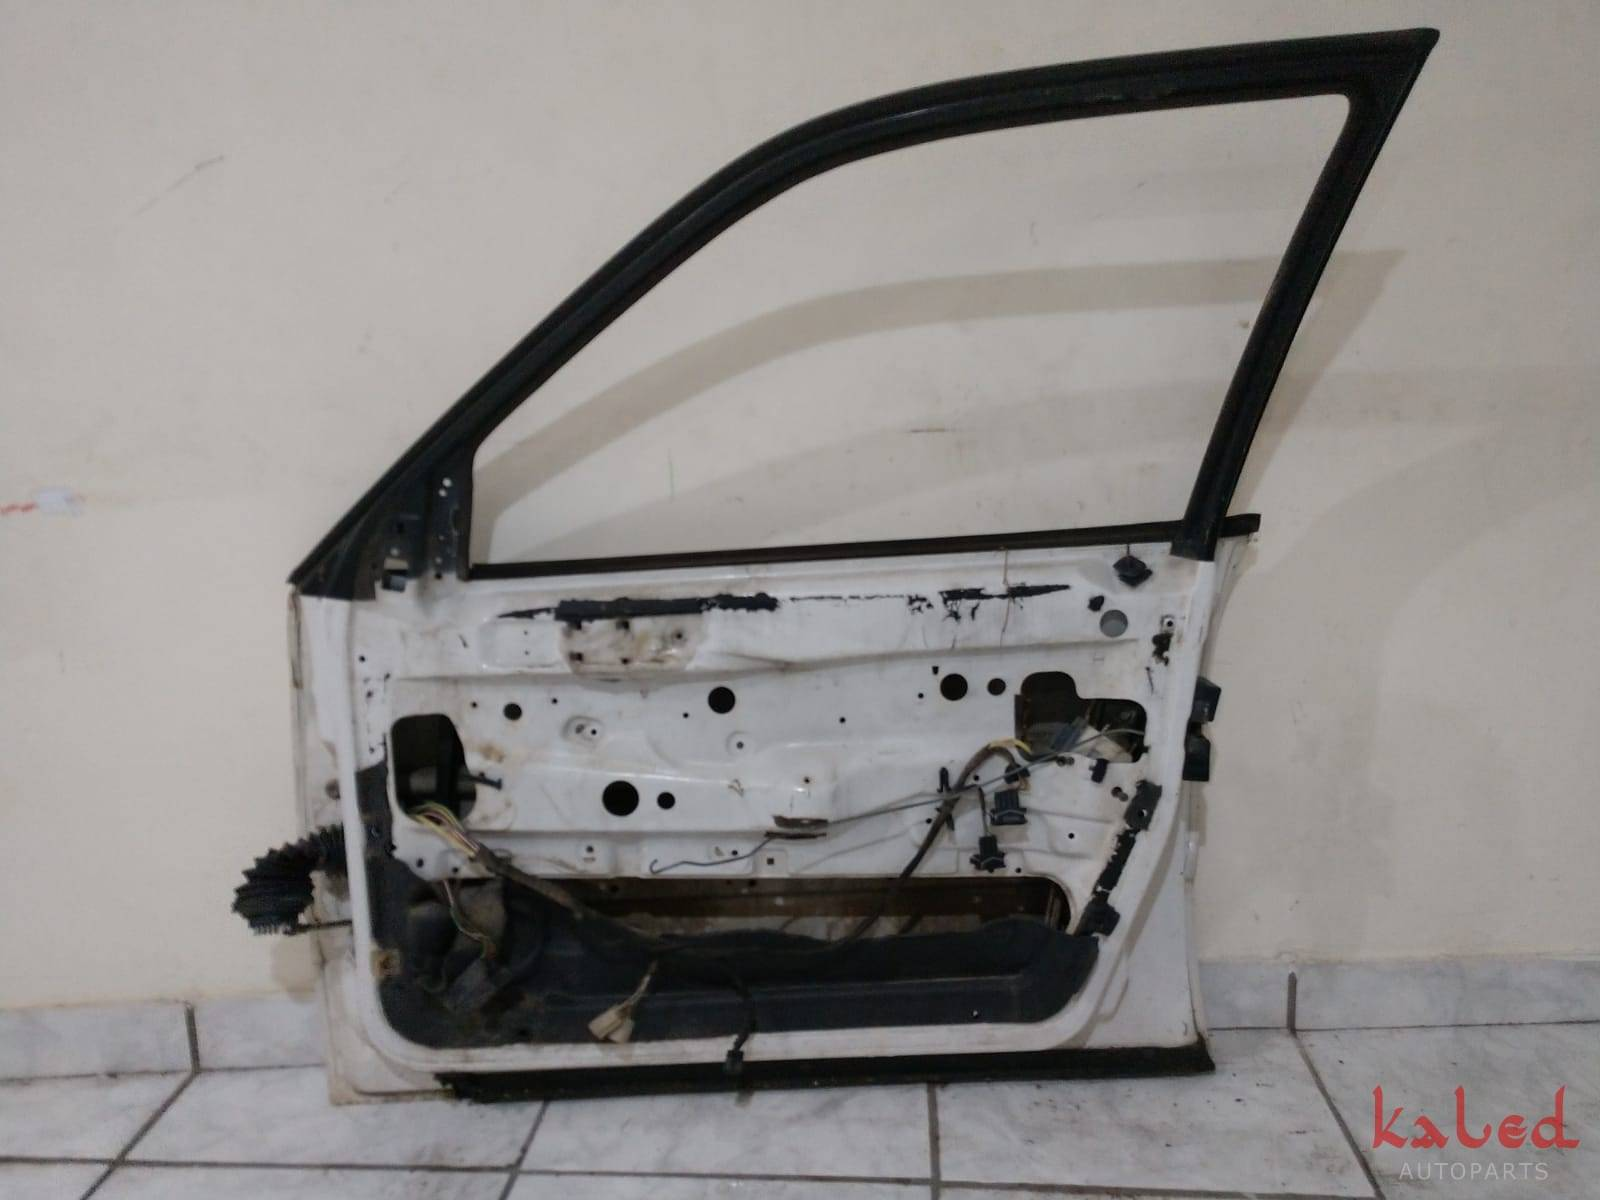 Porta dianteira direita VW Passat 93 a 96 - Kaled Auto Parts